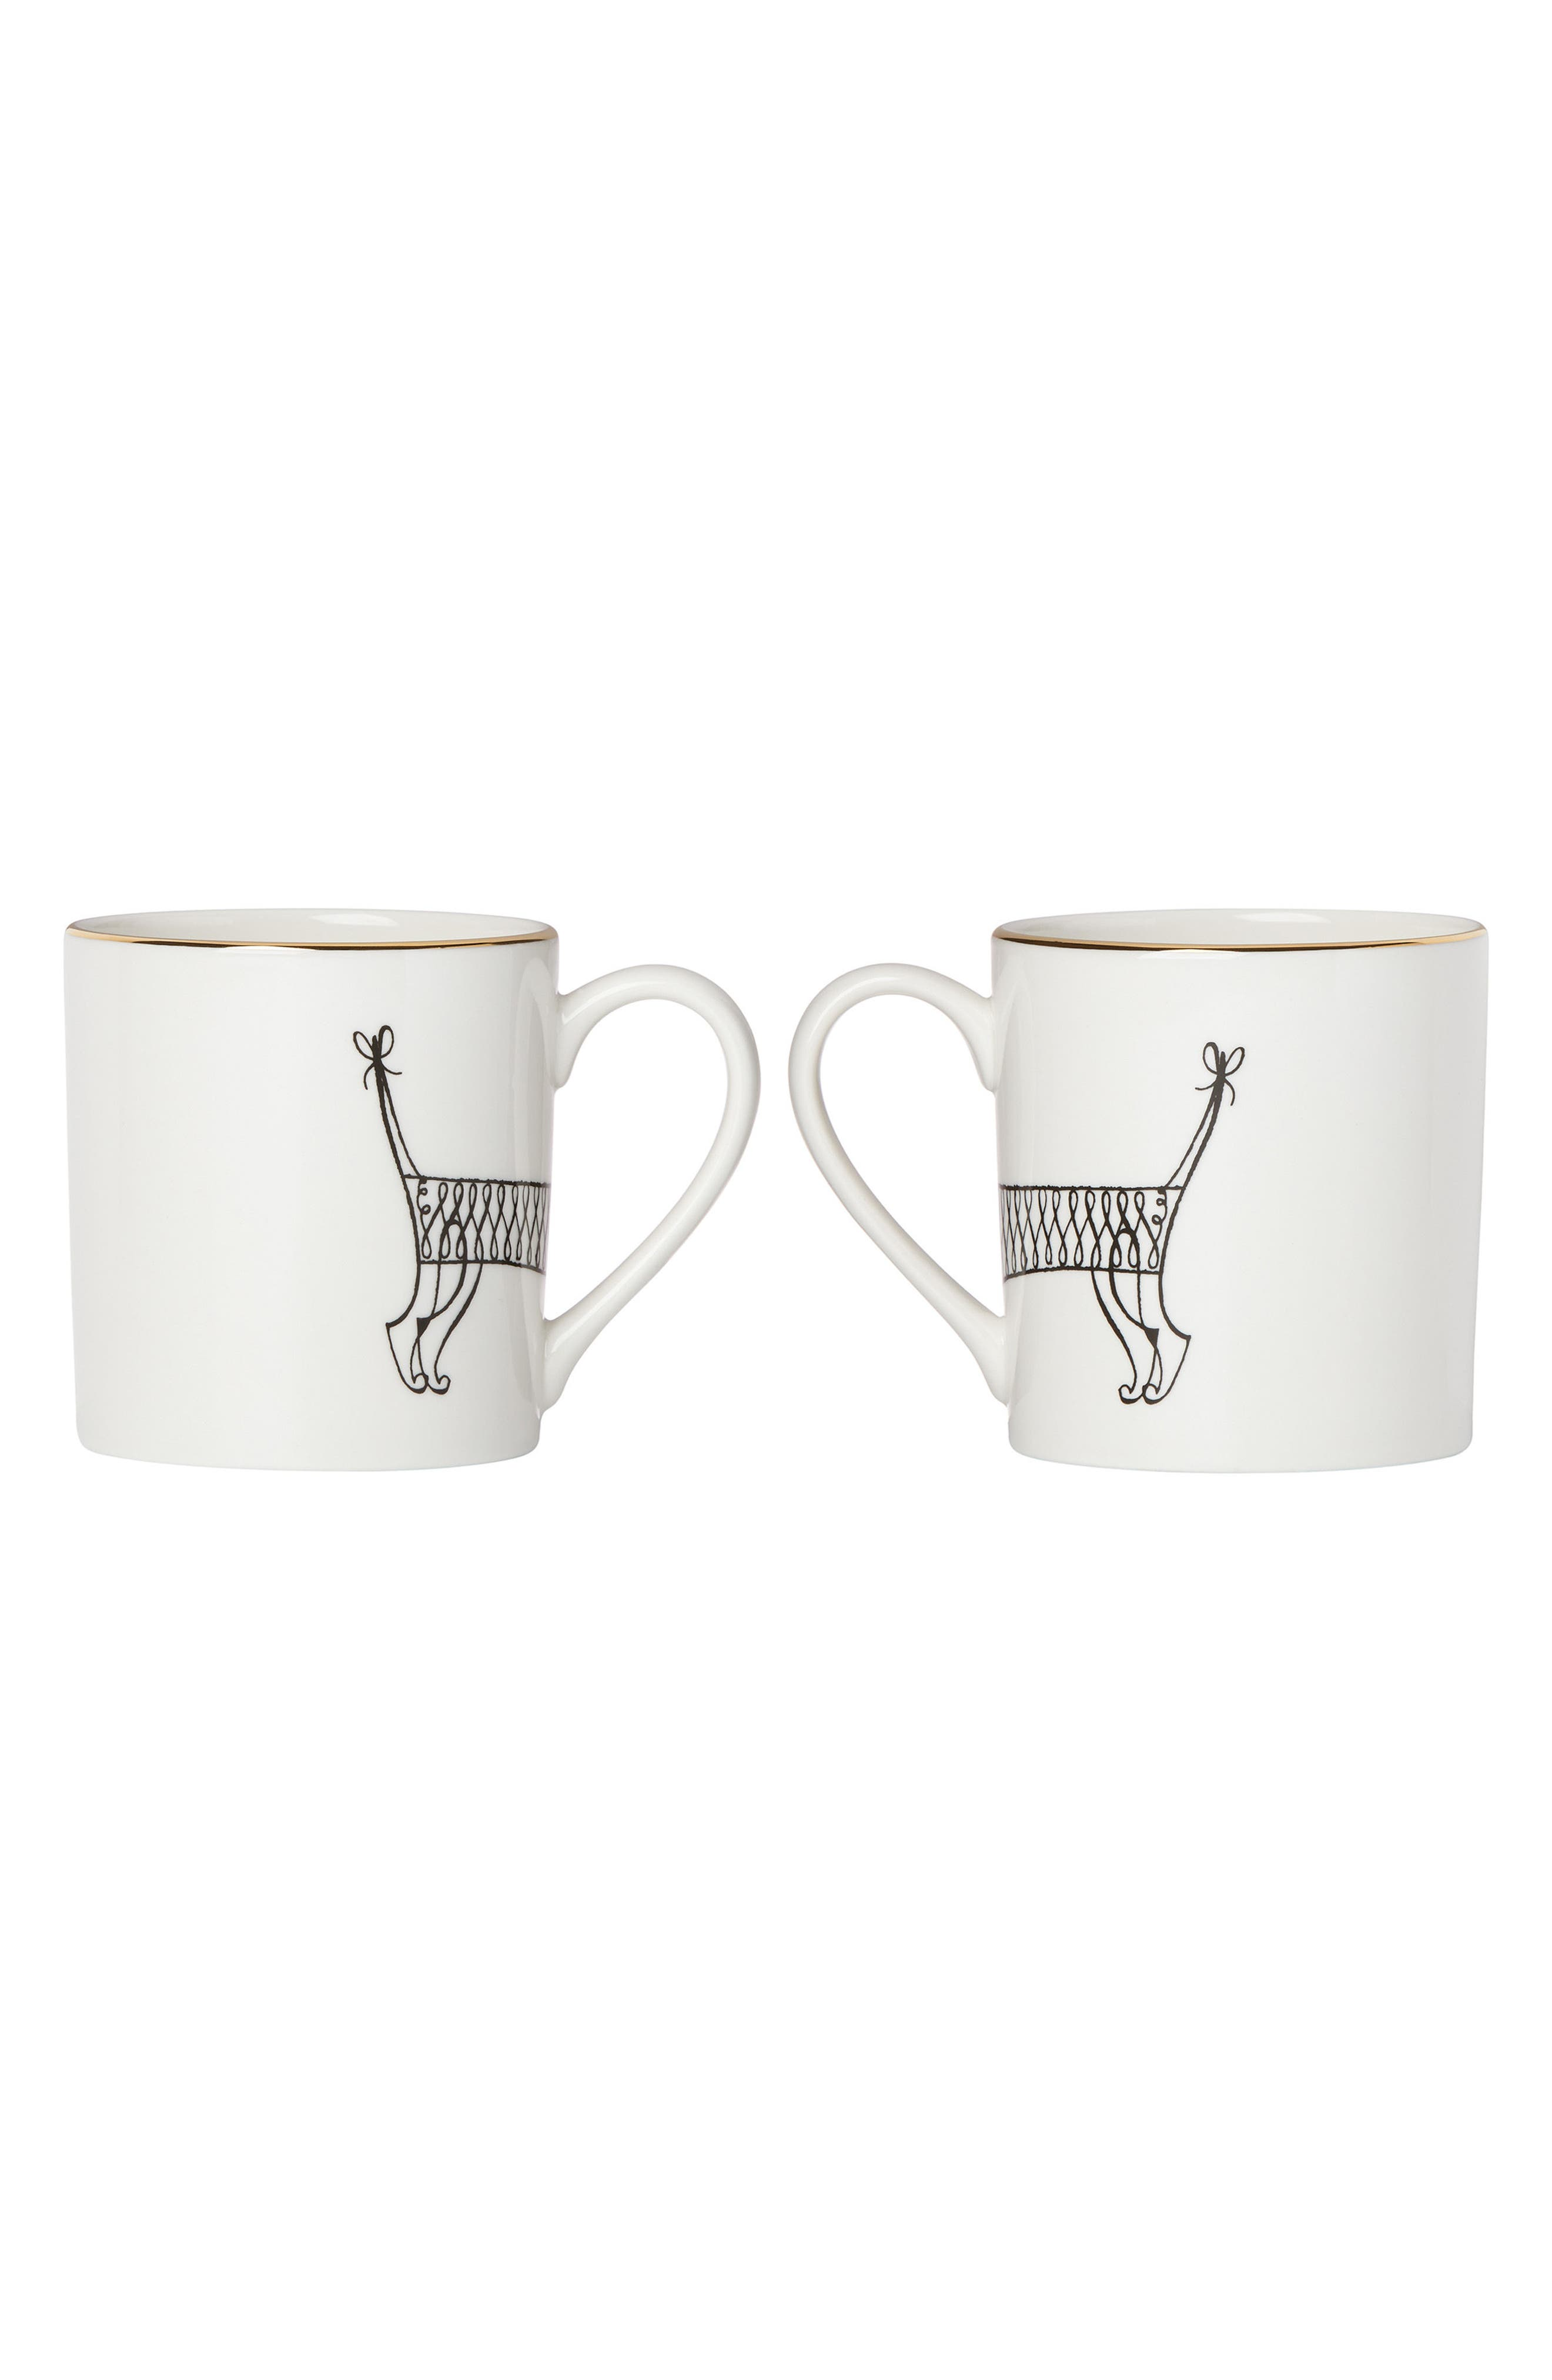 jingle all the way set of 2 mugs,                             Alternate thumbnail 2, color,